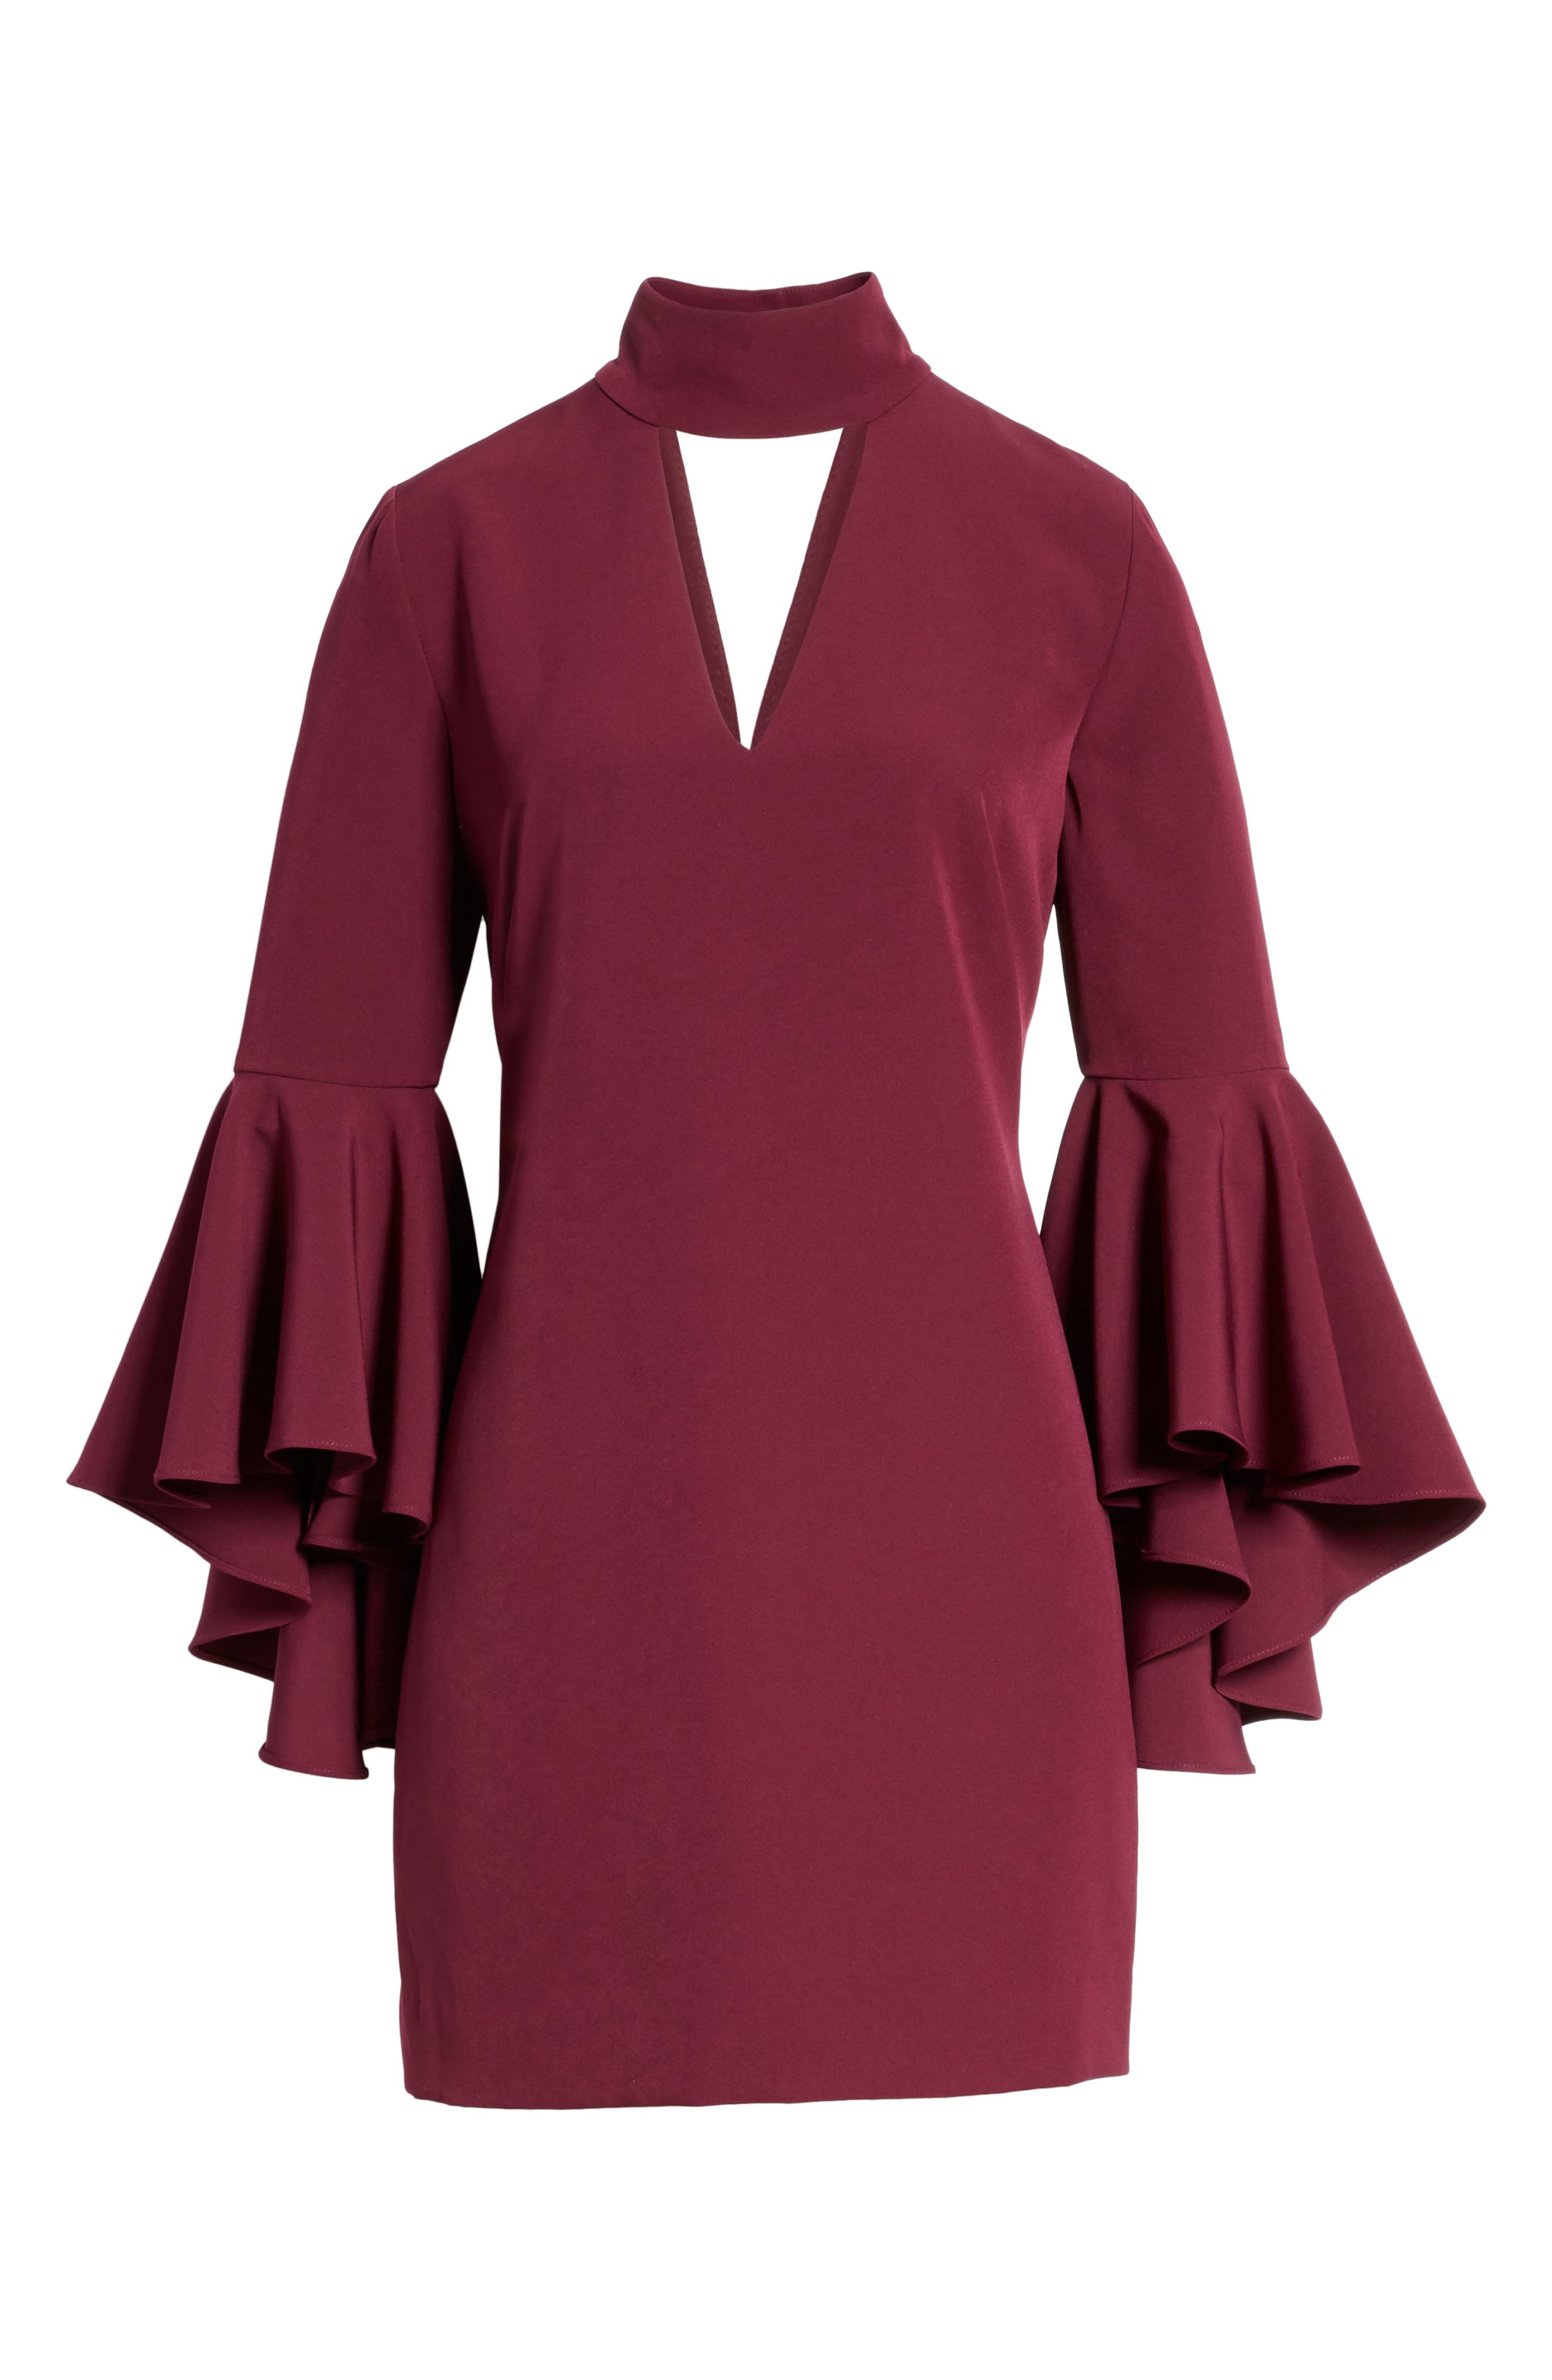 Andrea Italian Cady A-Line Dress,                             Alternate thumbnail 6, color,                             931